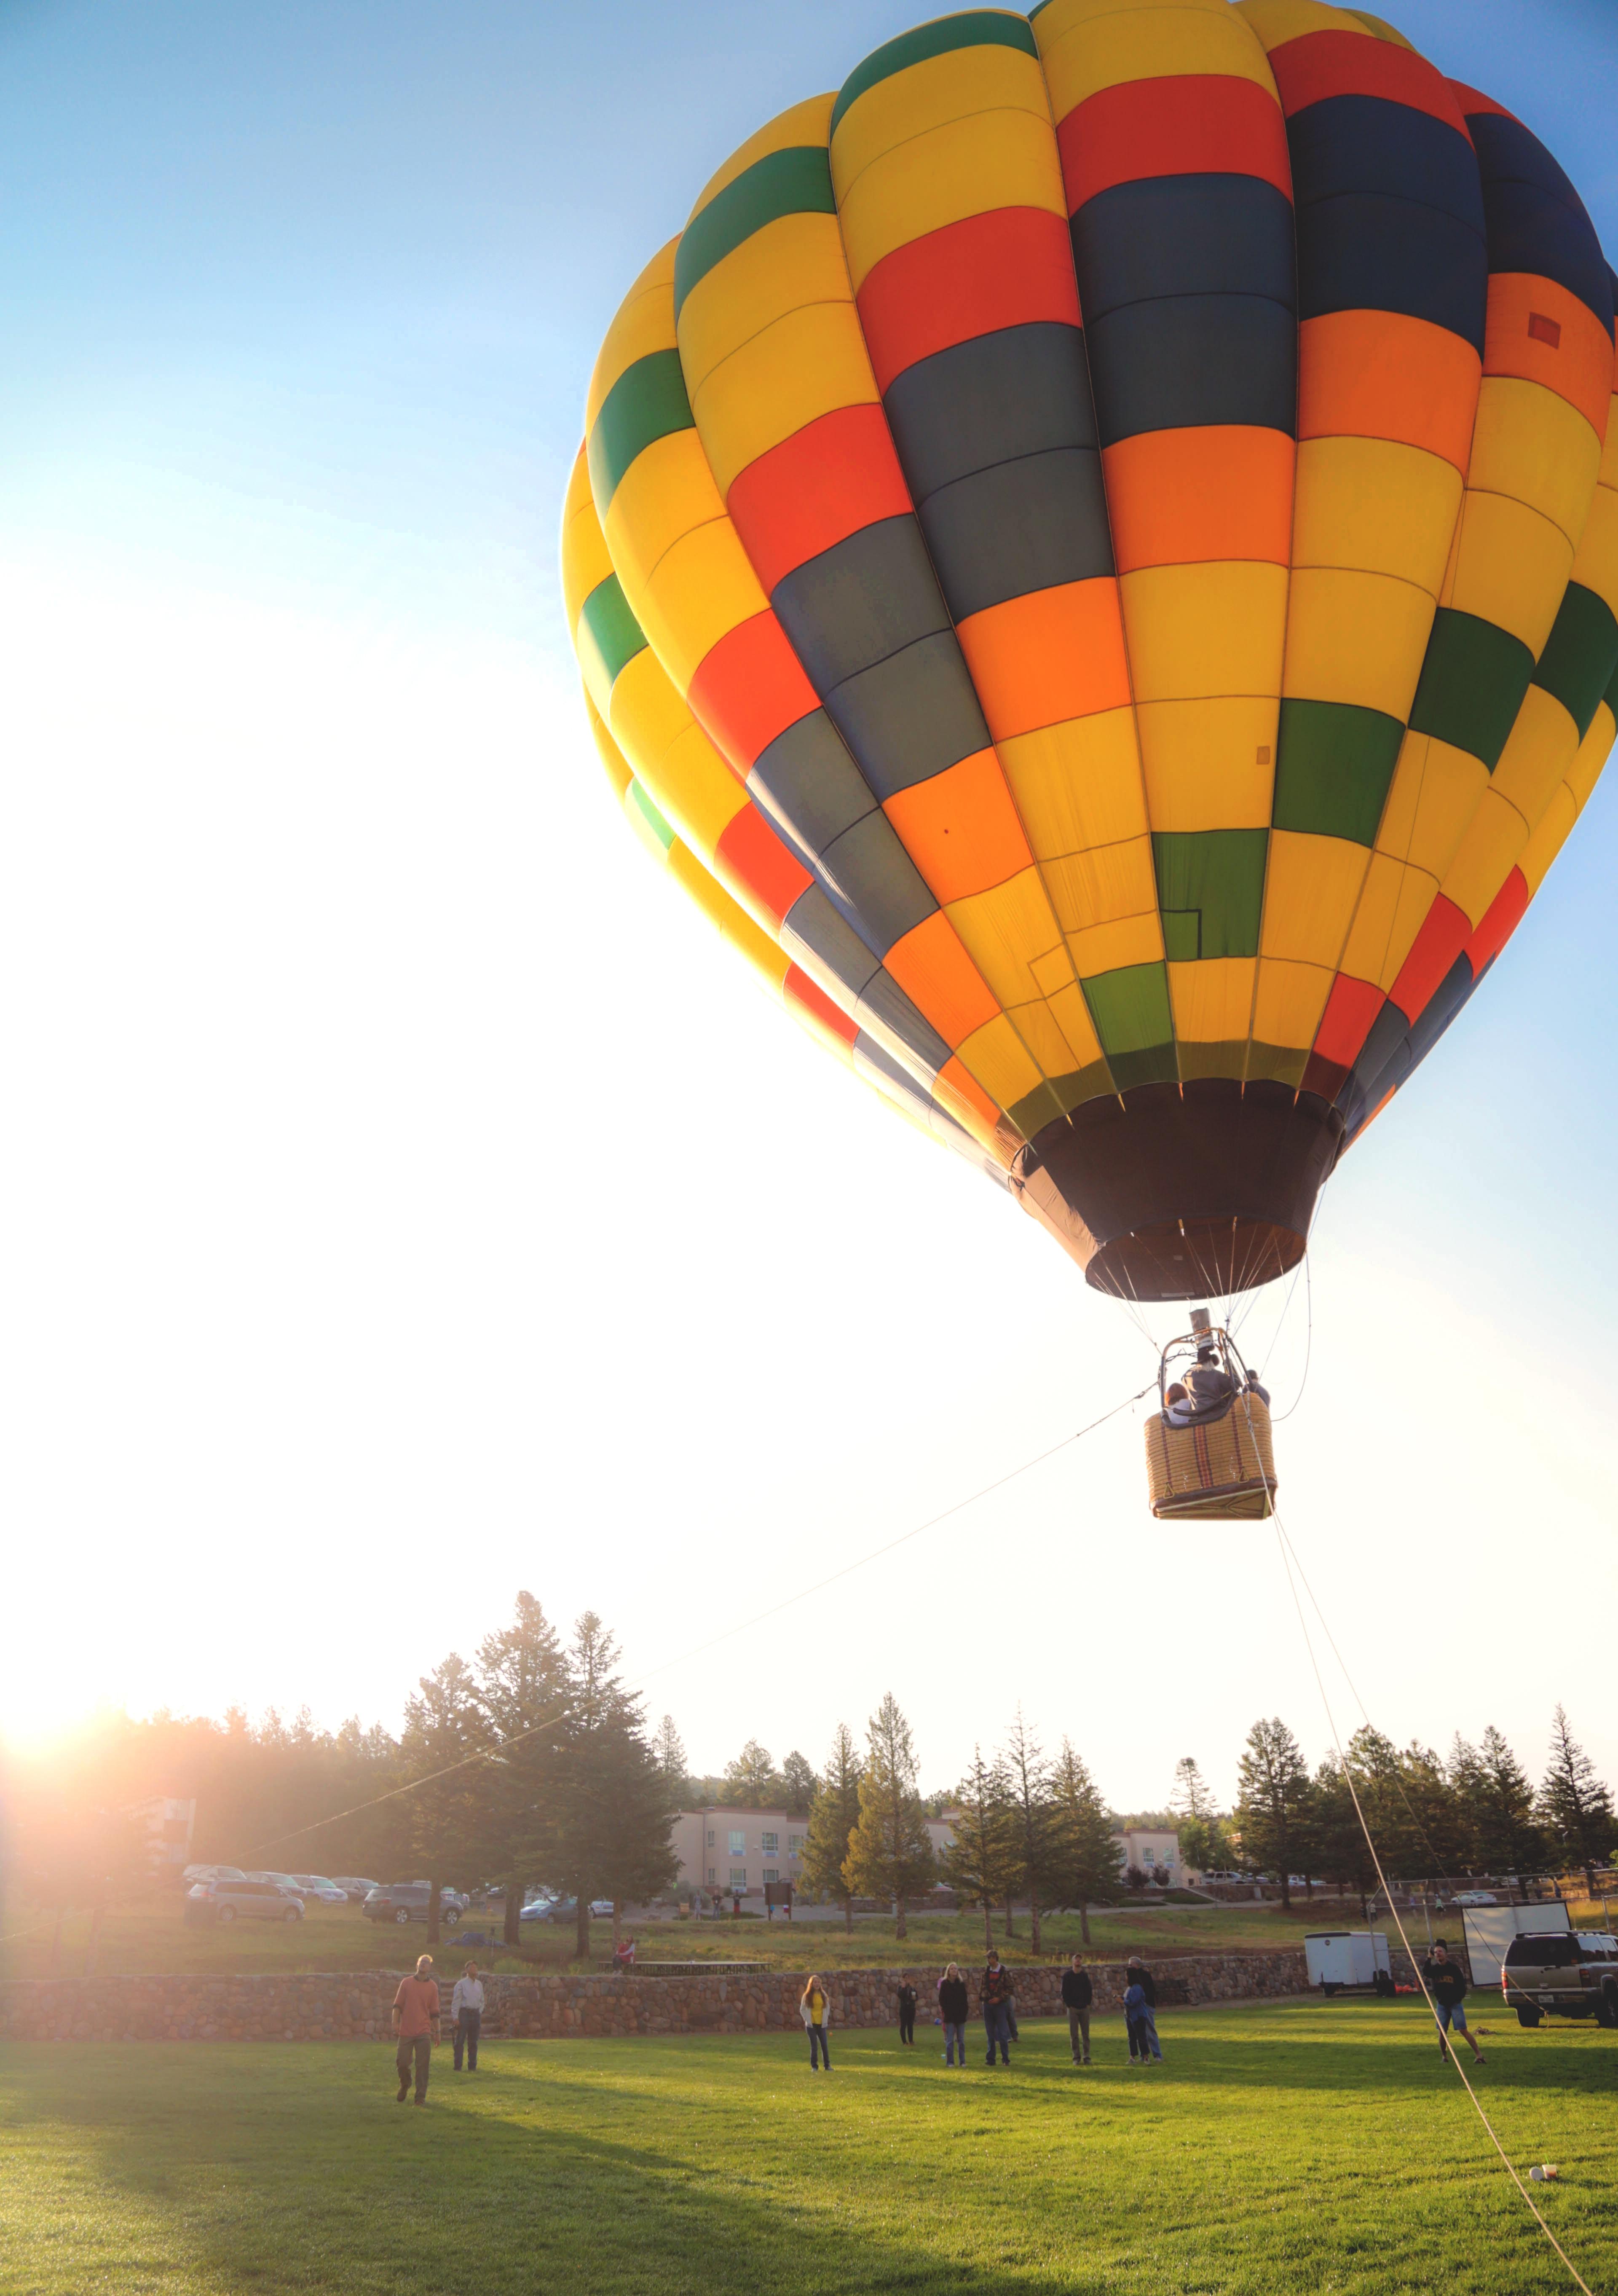 person riding hot air balloon